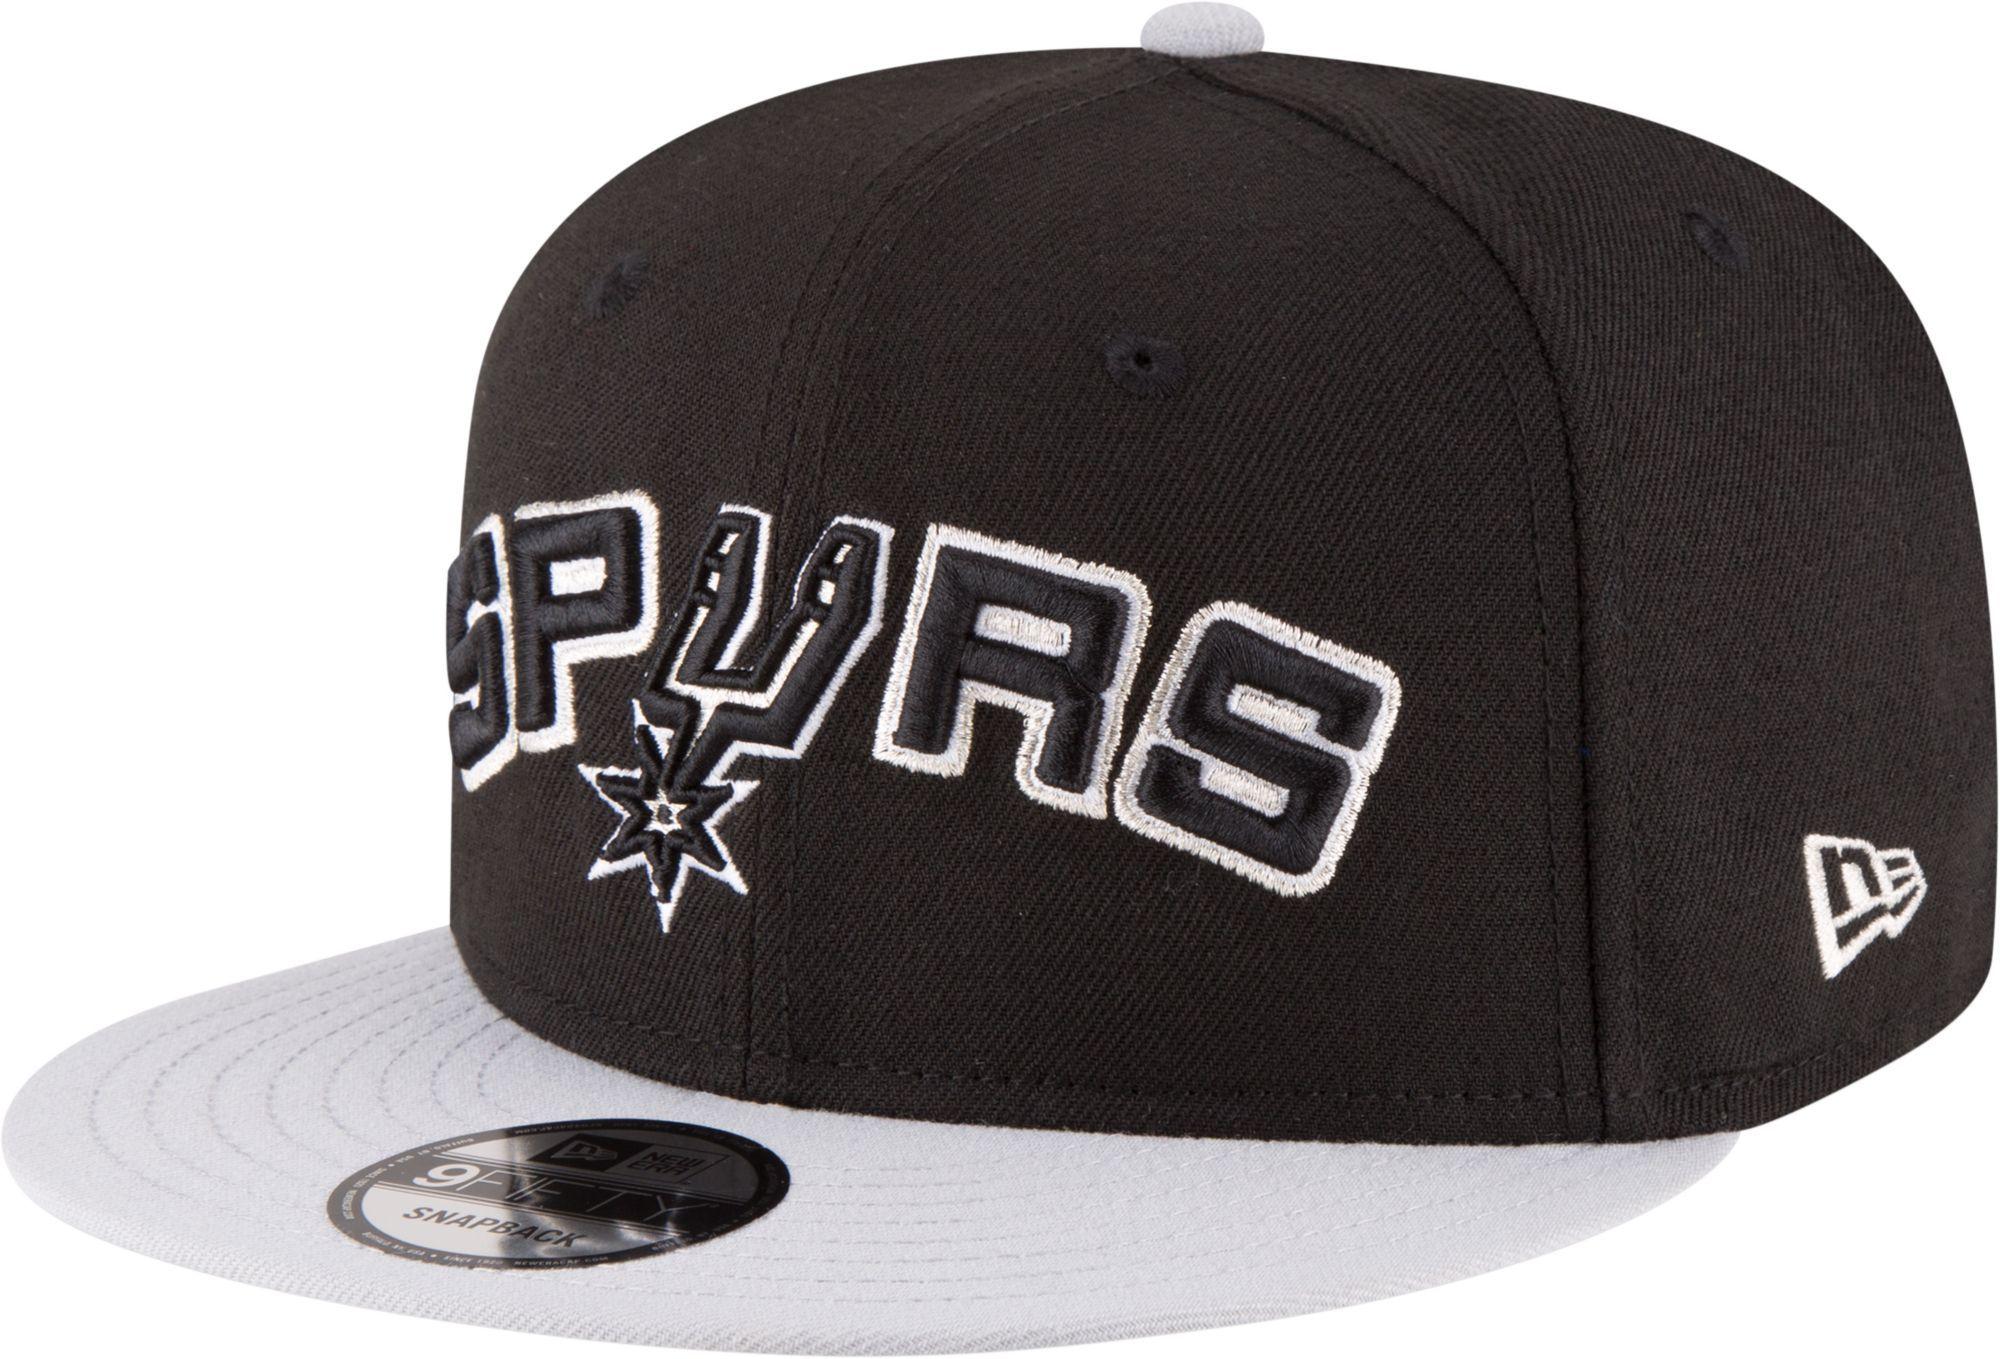 size 40 5840f 73a03 New Era Men s San Antonio Spurs 9Fifty Adjustable Snapback Hat, Team